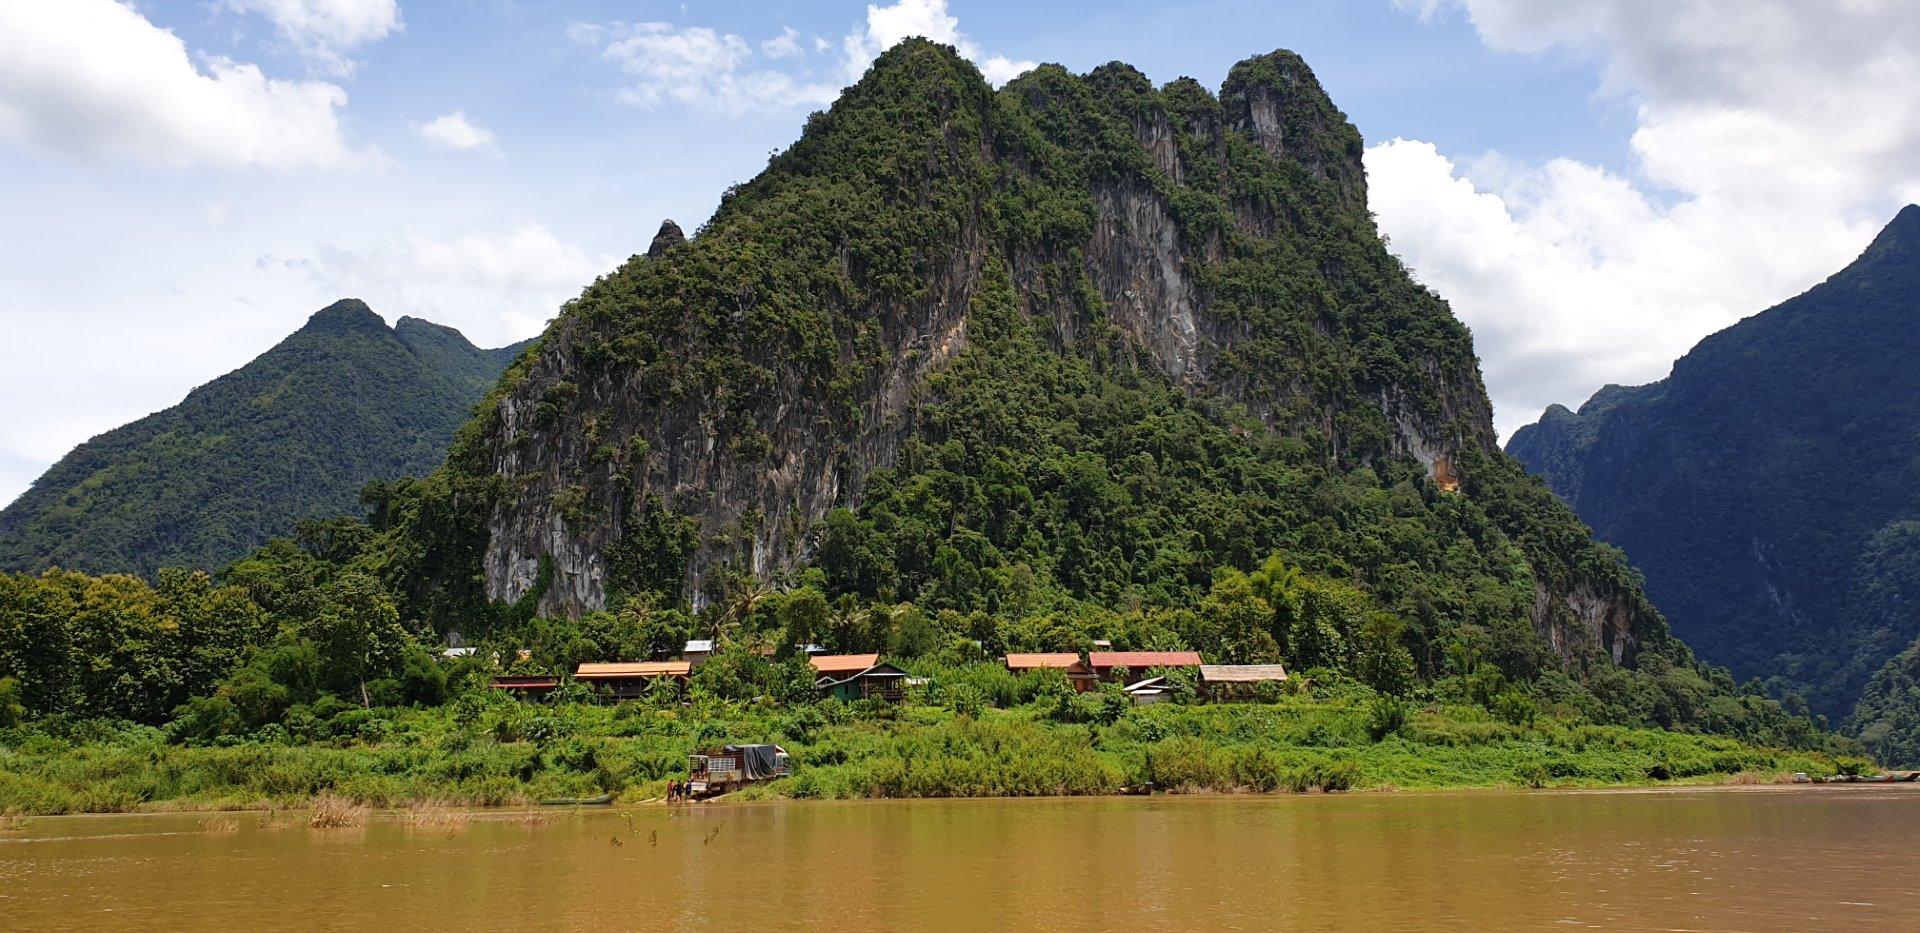 Favorite Secret Places - travel landmarks nature | Ask